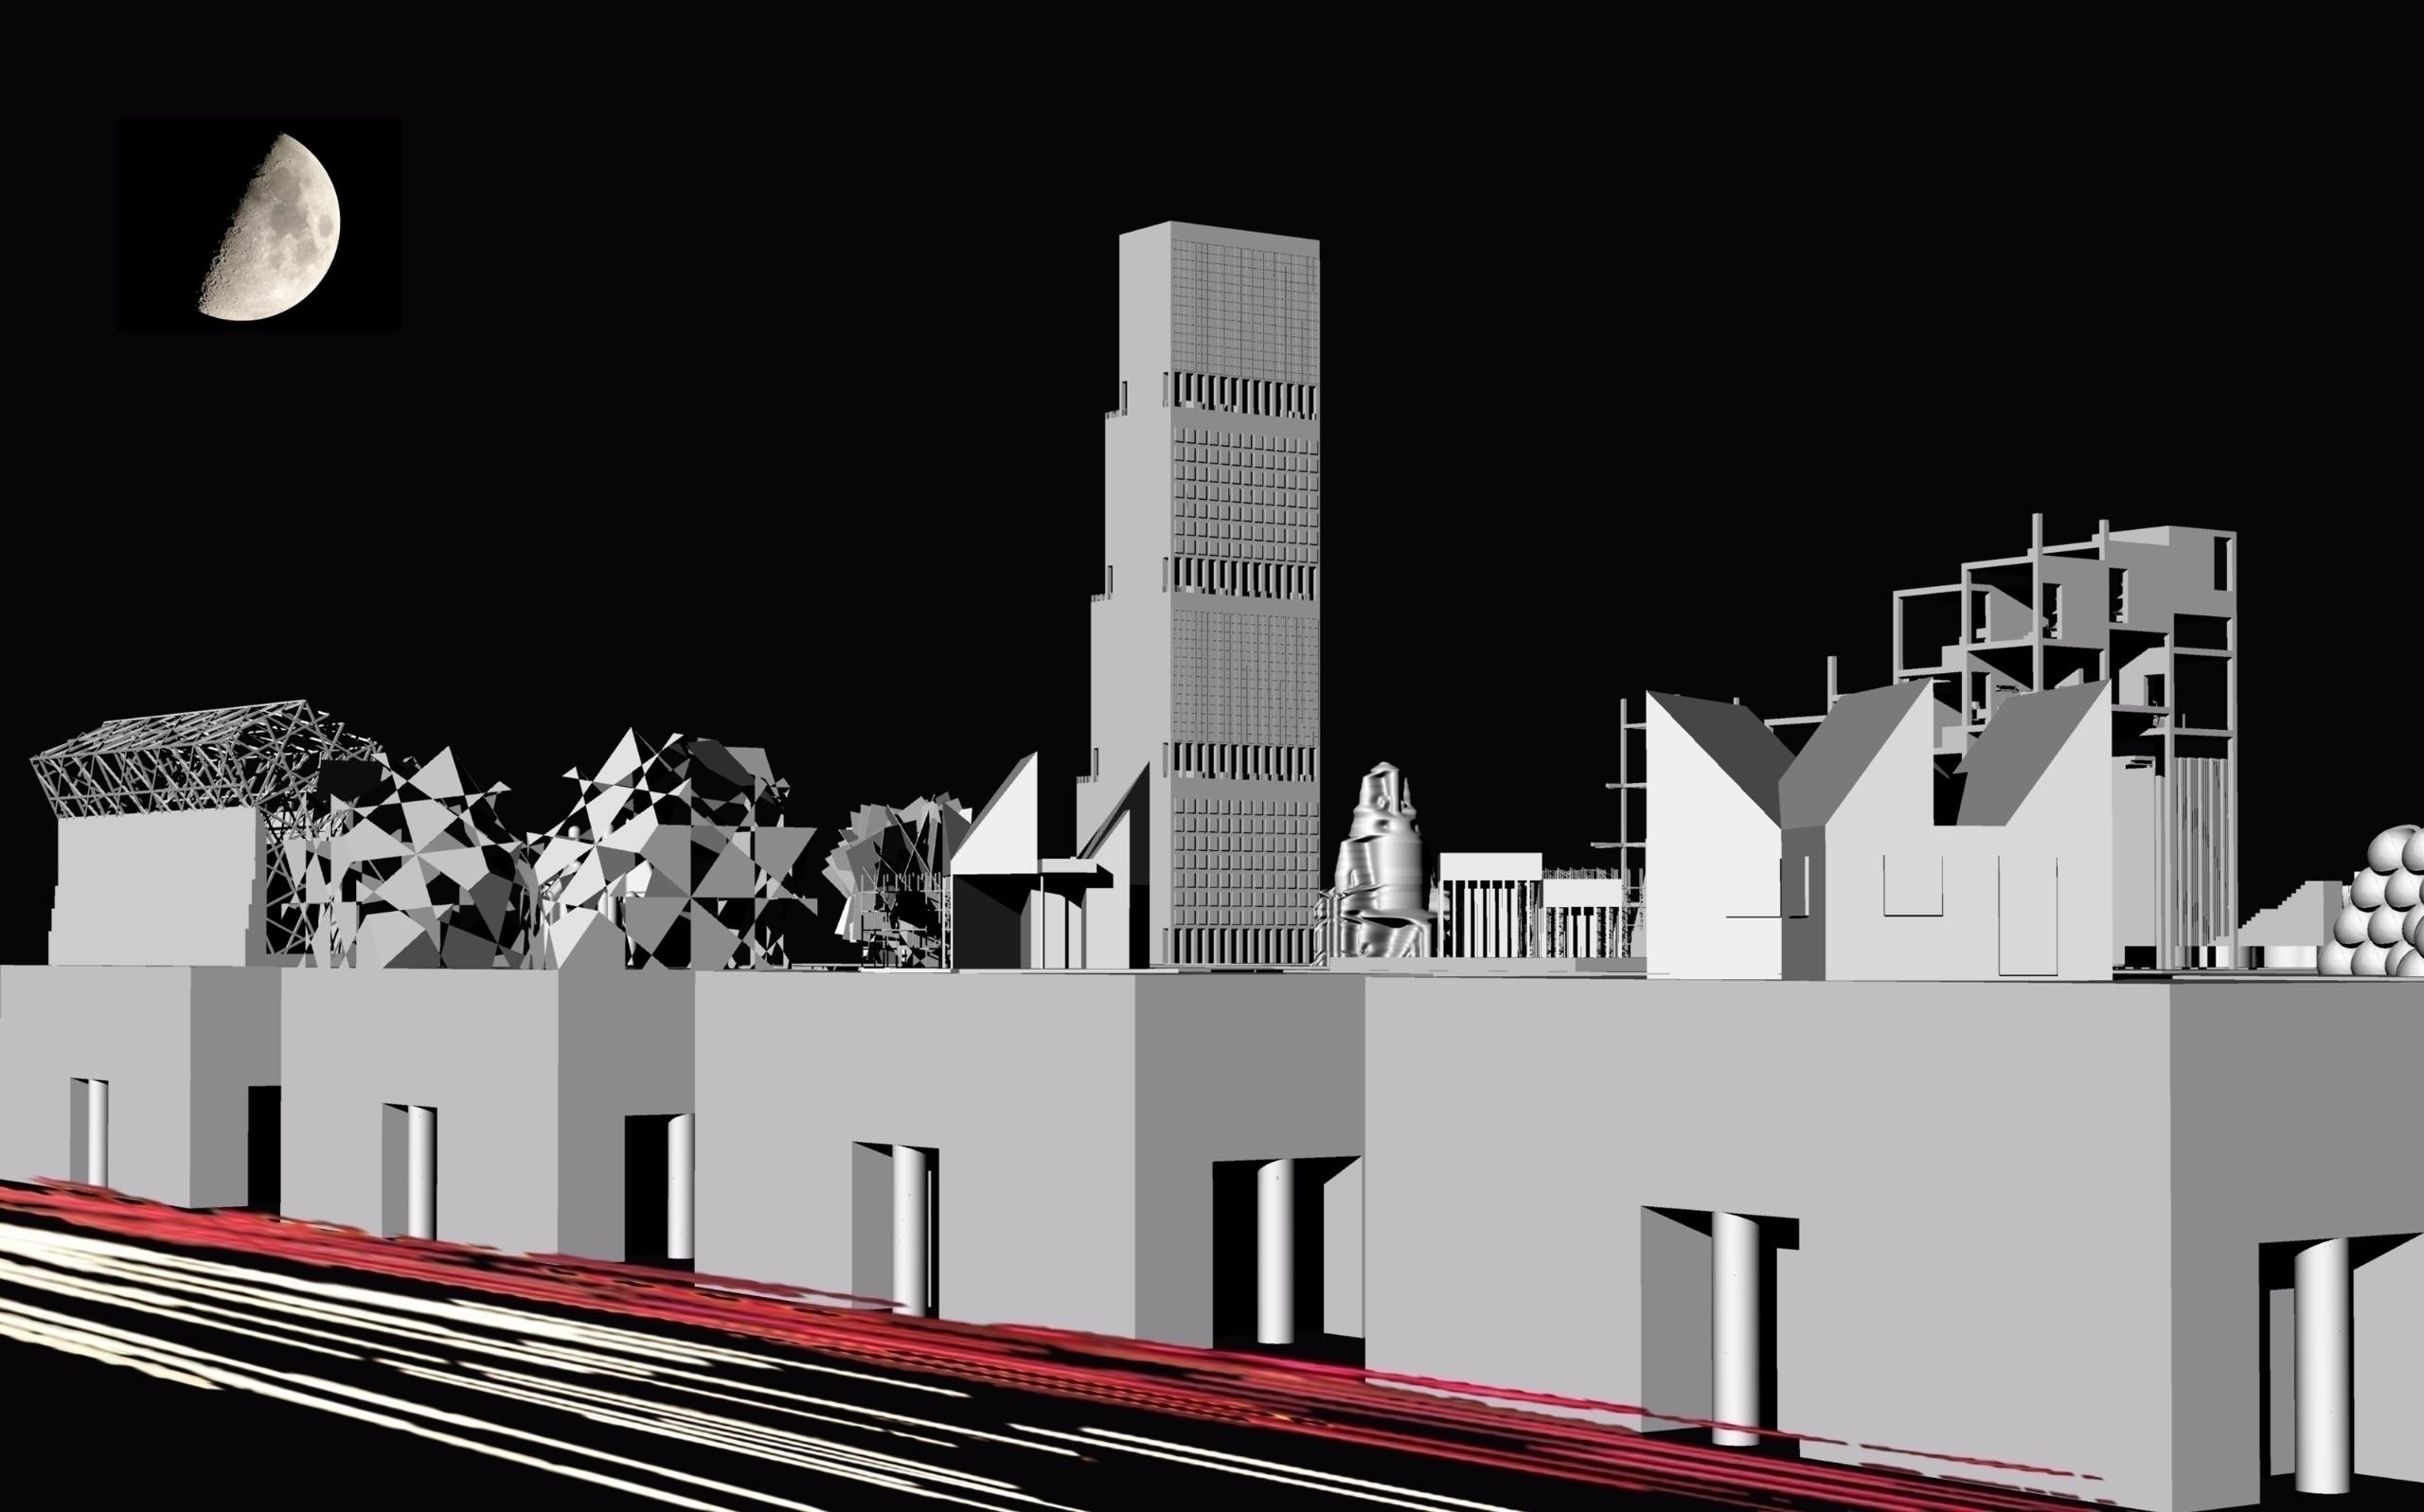 Metropolis - examined night ask - charles_3_1416 | ello